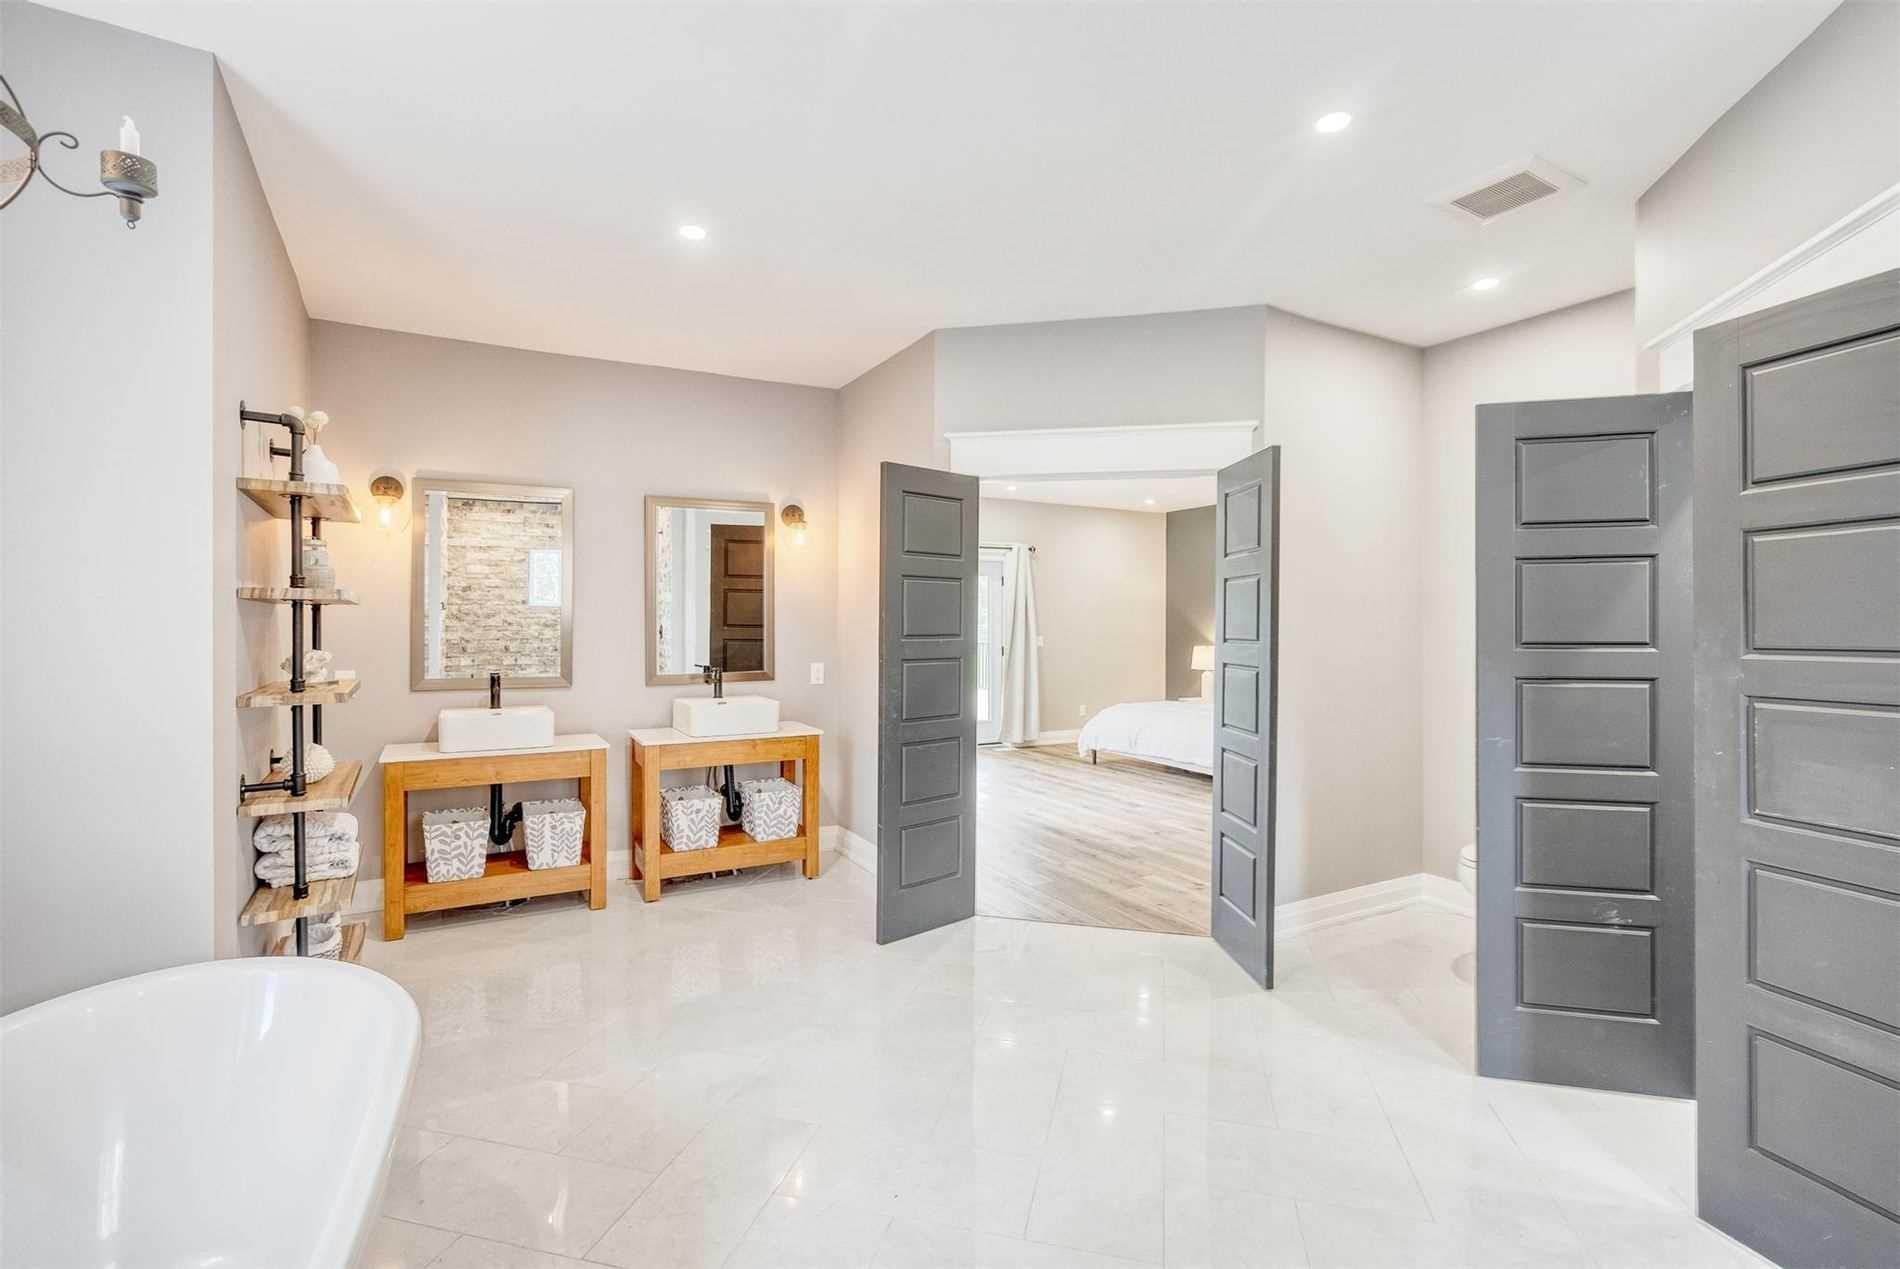 772 Bowmanton Rd, Hamilton Township, Ontario K0K1C0, 4 Bedrooms Bedrooms, 16 Rooms Rooms,4 BathroomsBathrooms,Detached,For Sale,Bowmanton,X5324381